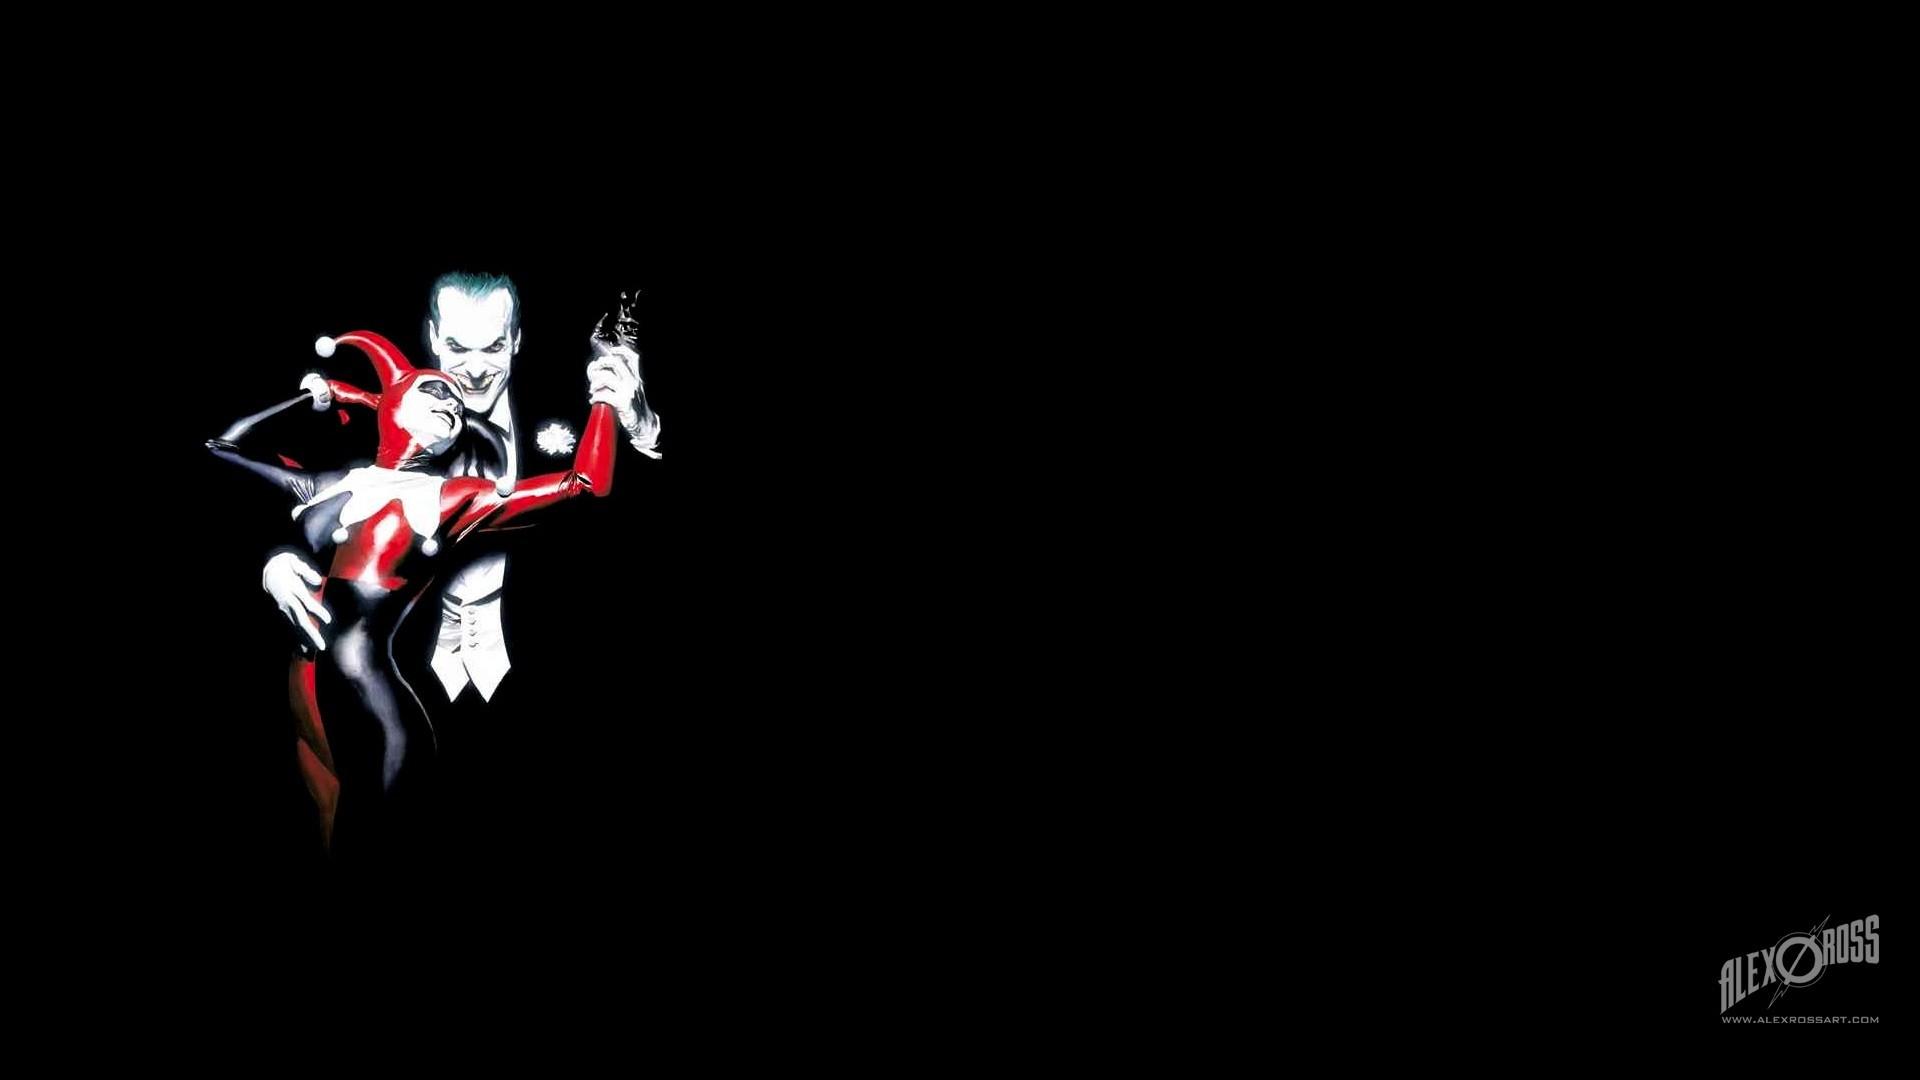 Joker and Harley Quinn Wallpaper 1920x1080